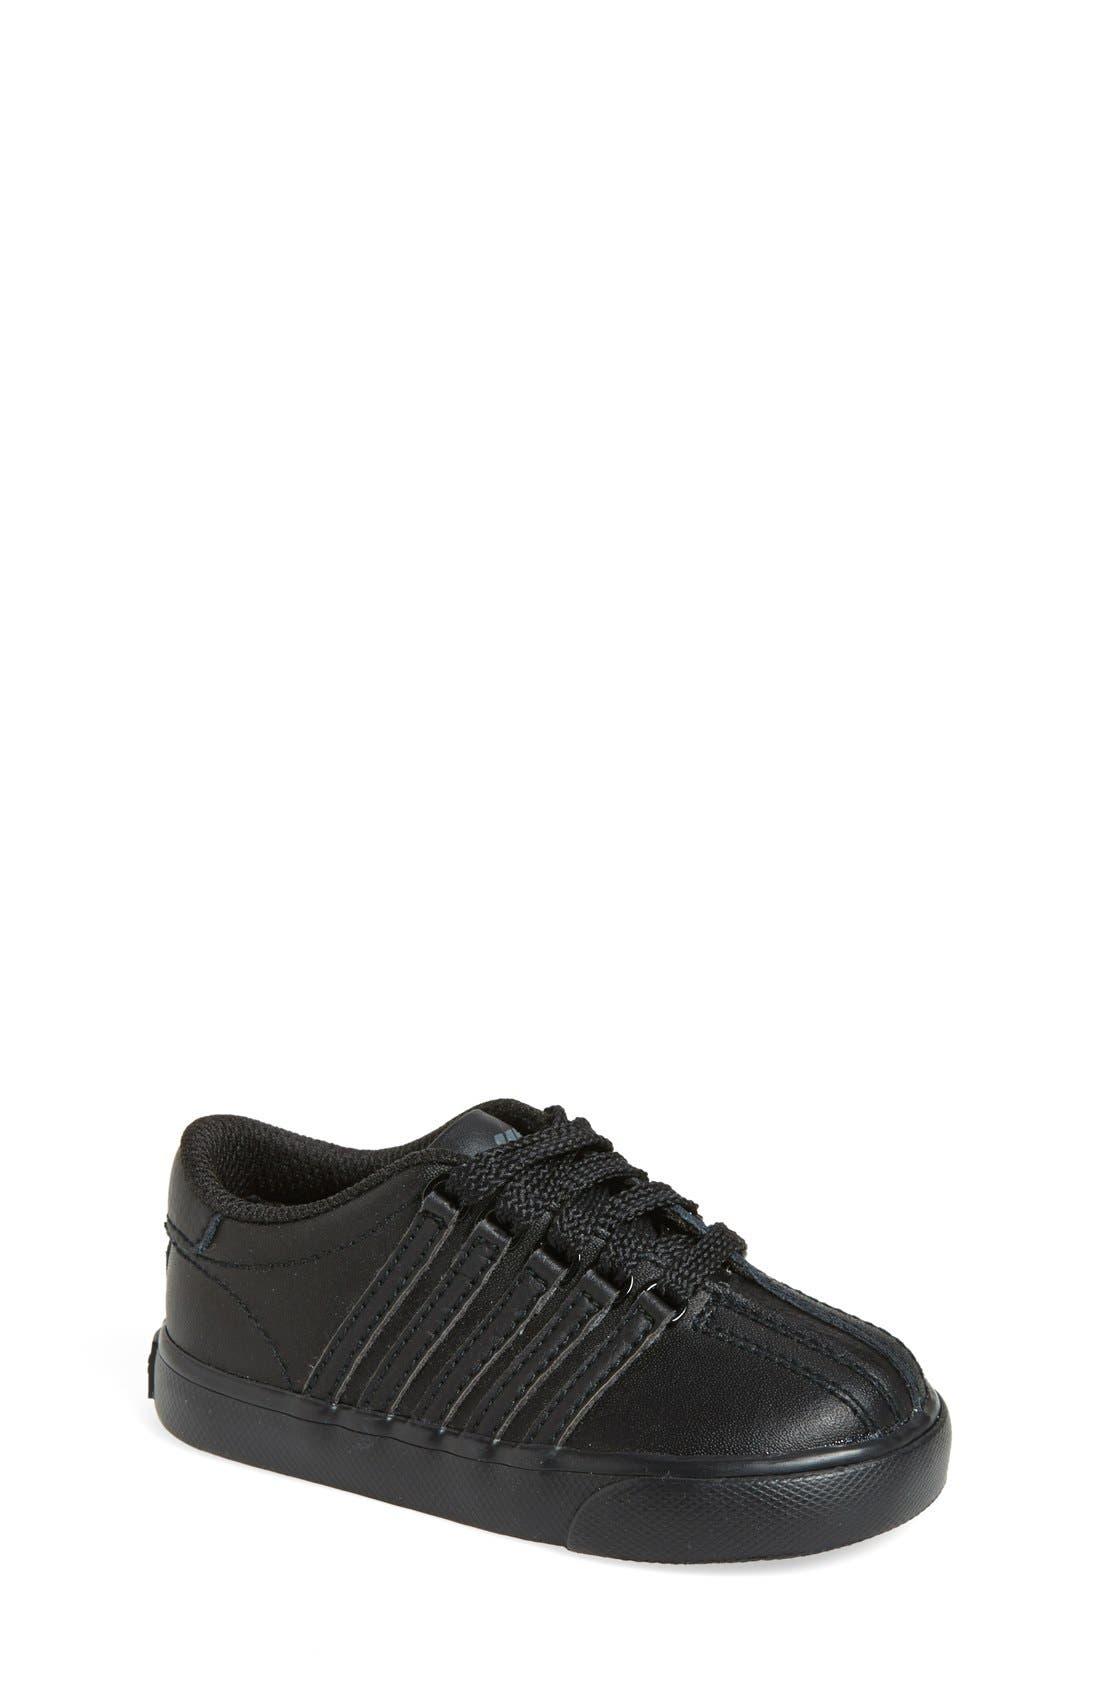 'Classic' Sneaker,                             Main thumbnail 1, color,                             001